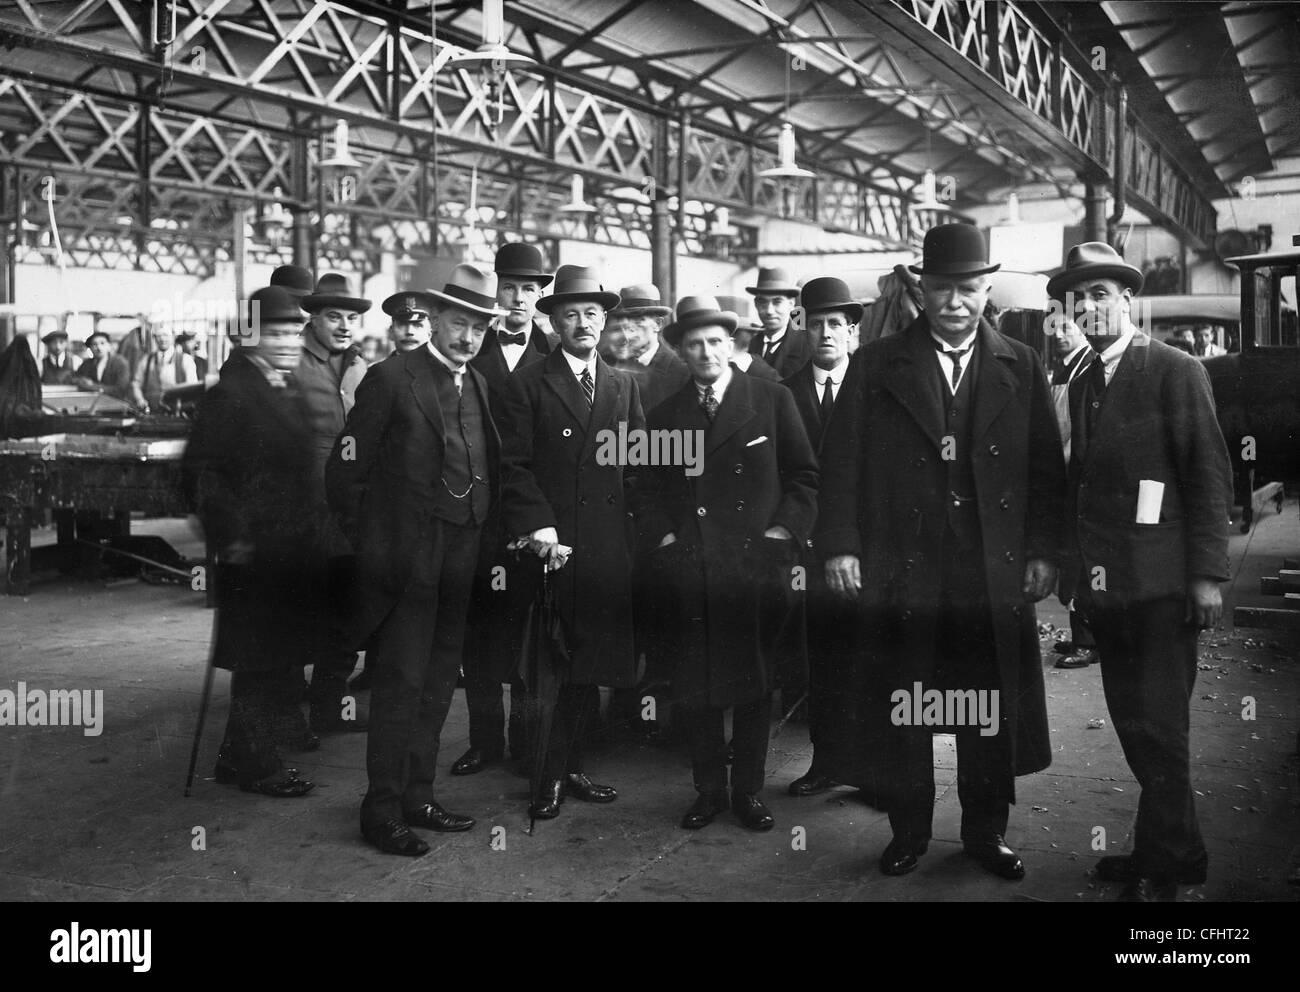 Premierminister von Neuseeland Besuch, Sunbeam Motor Car Company, Wolverhampton, 13. Dezember 1923. Stockbild